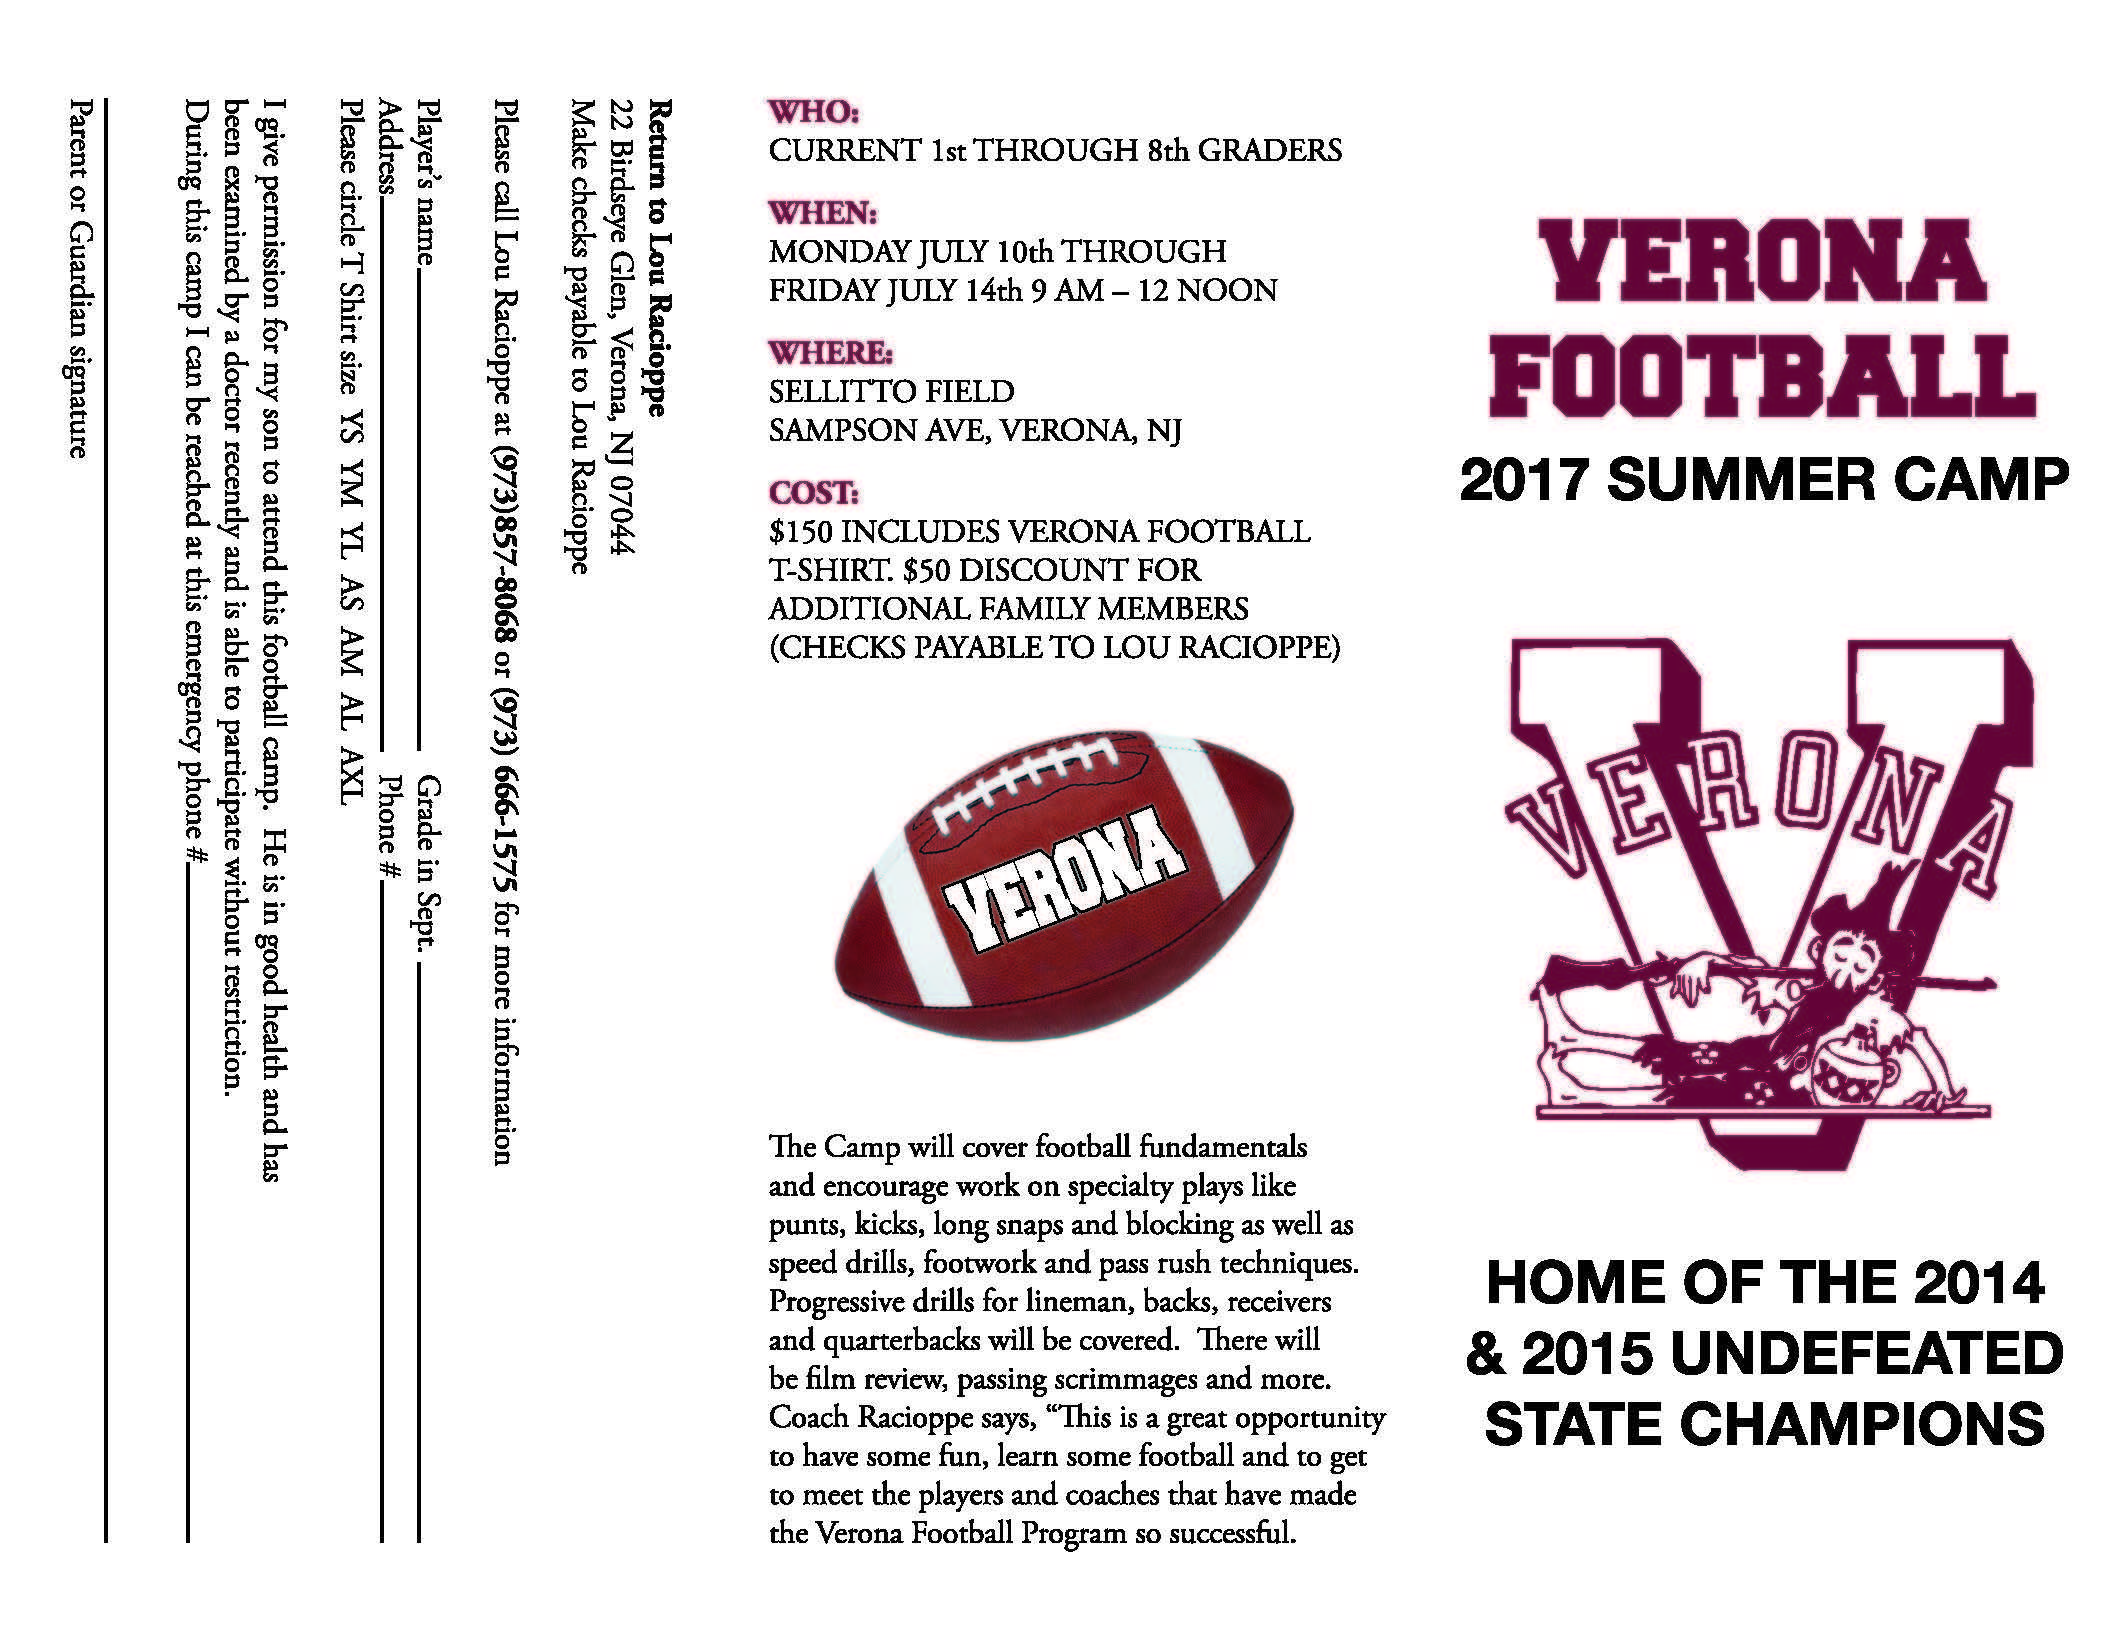 343ea8fa0a9c413de01b_VHS_Football_Camp_2017_Page_1.jpg